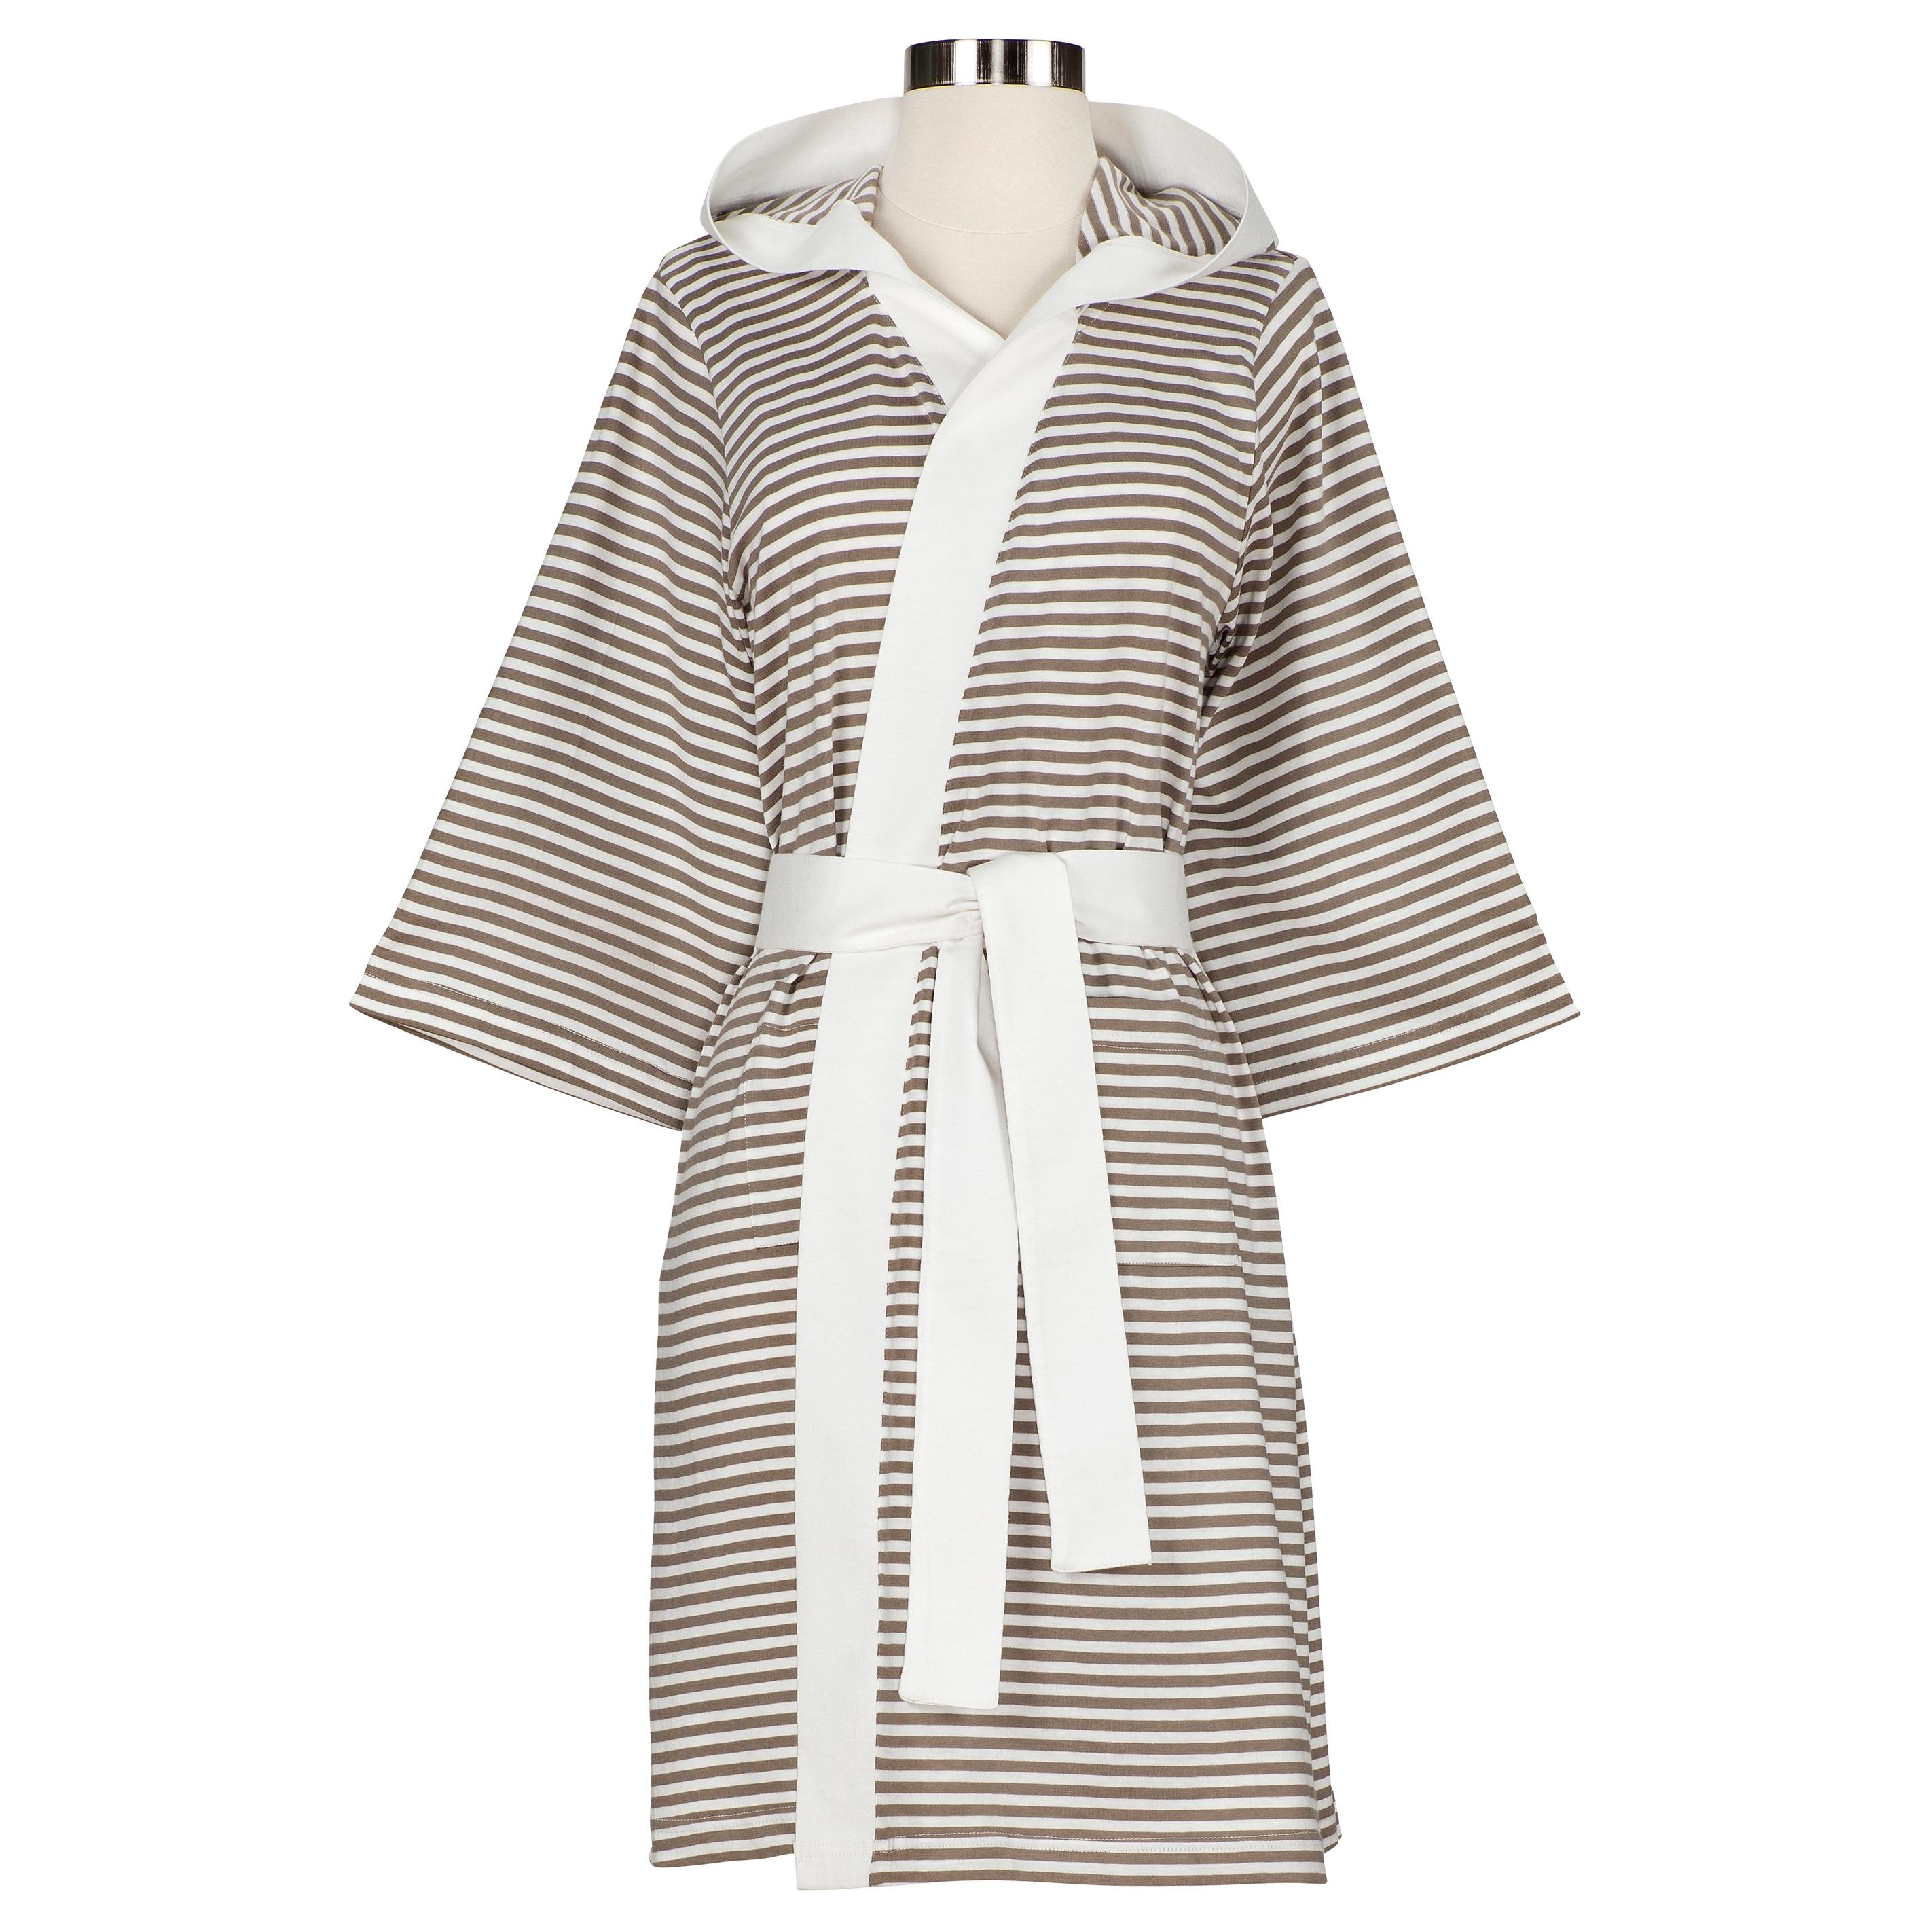 Shop Women s Organic Cotton Stripe Bath Robe - On Sale - Free Shipping Today  - Overstock - 7458364 7ca5a4bb7